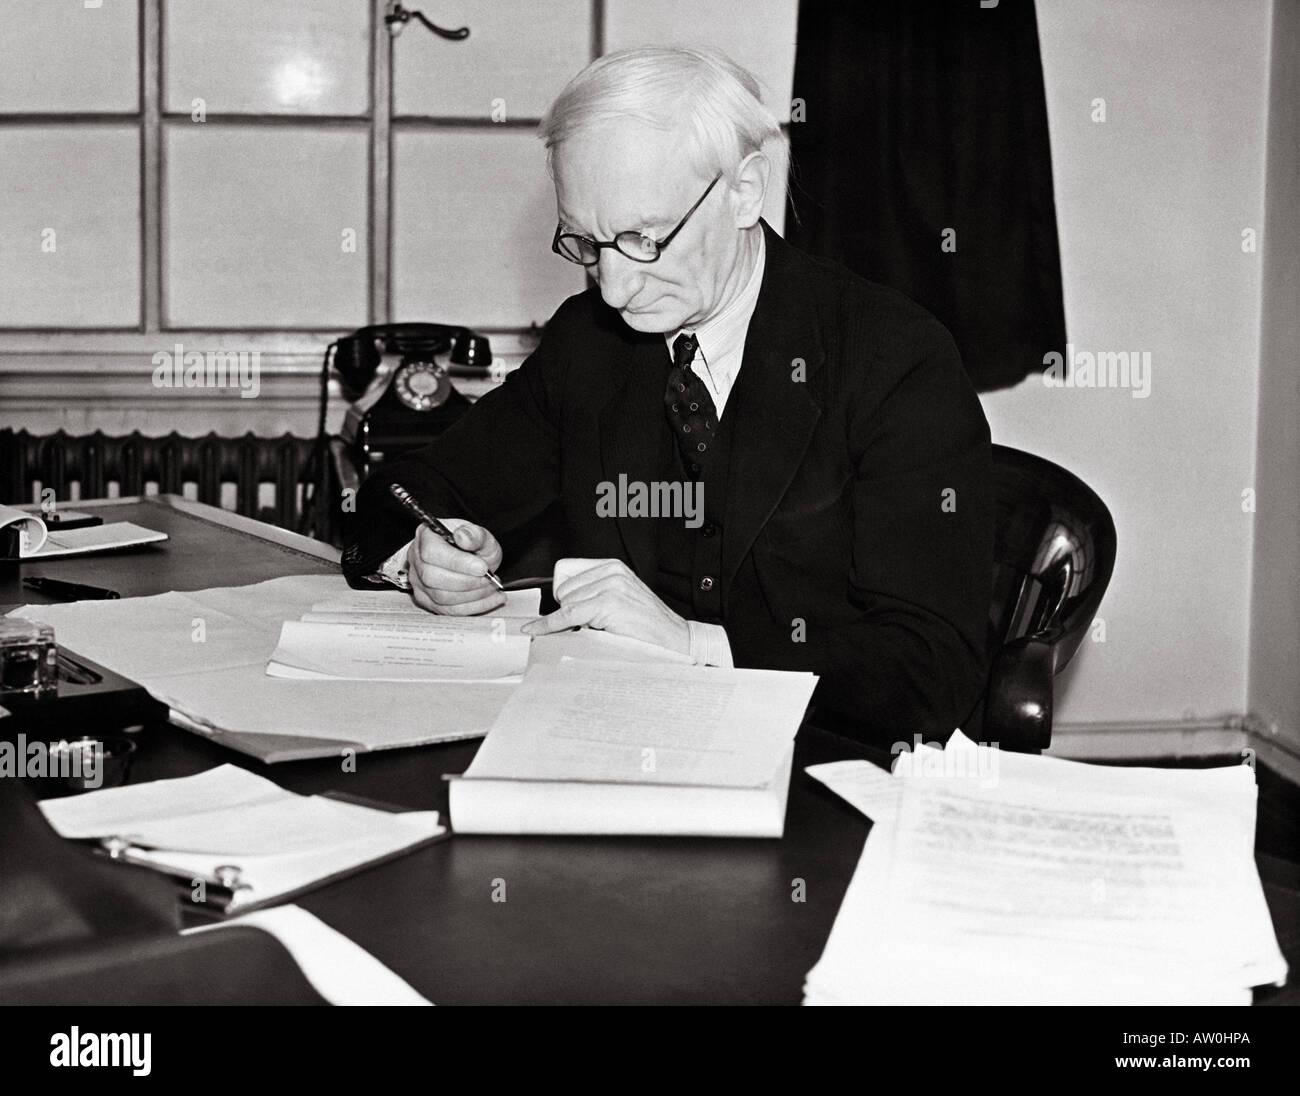 SIR WILLIAM BEVERIDGE 1879 to 1963  British economist and social reformer  in 1942 - see description below - Stock Image